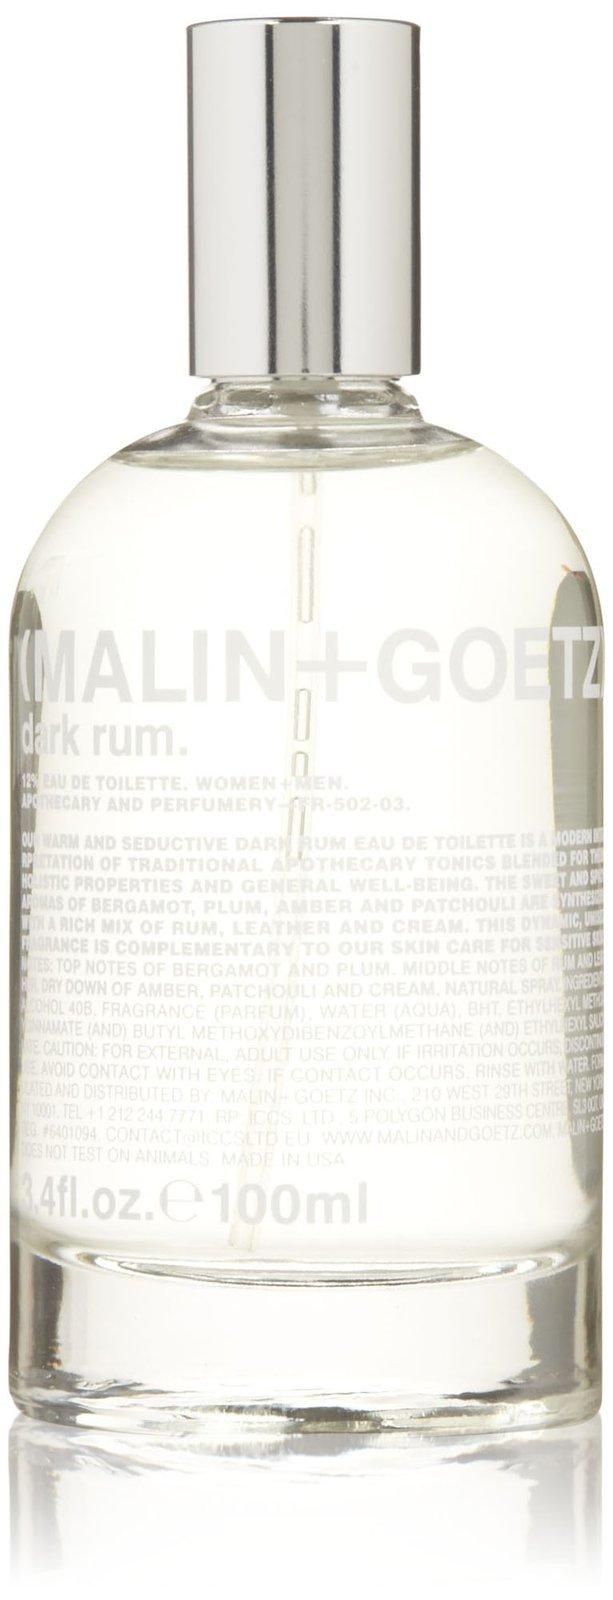 Malin + Goetz Eau de Toilette, Dark Rum, 3.4 Ounce